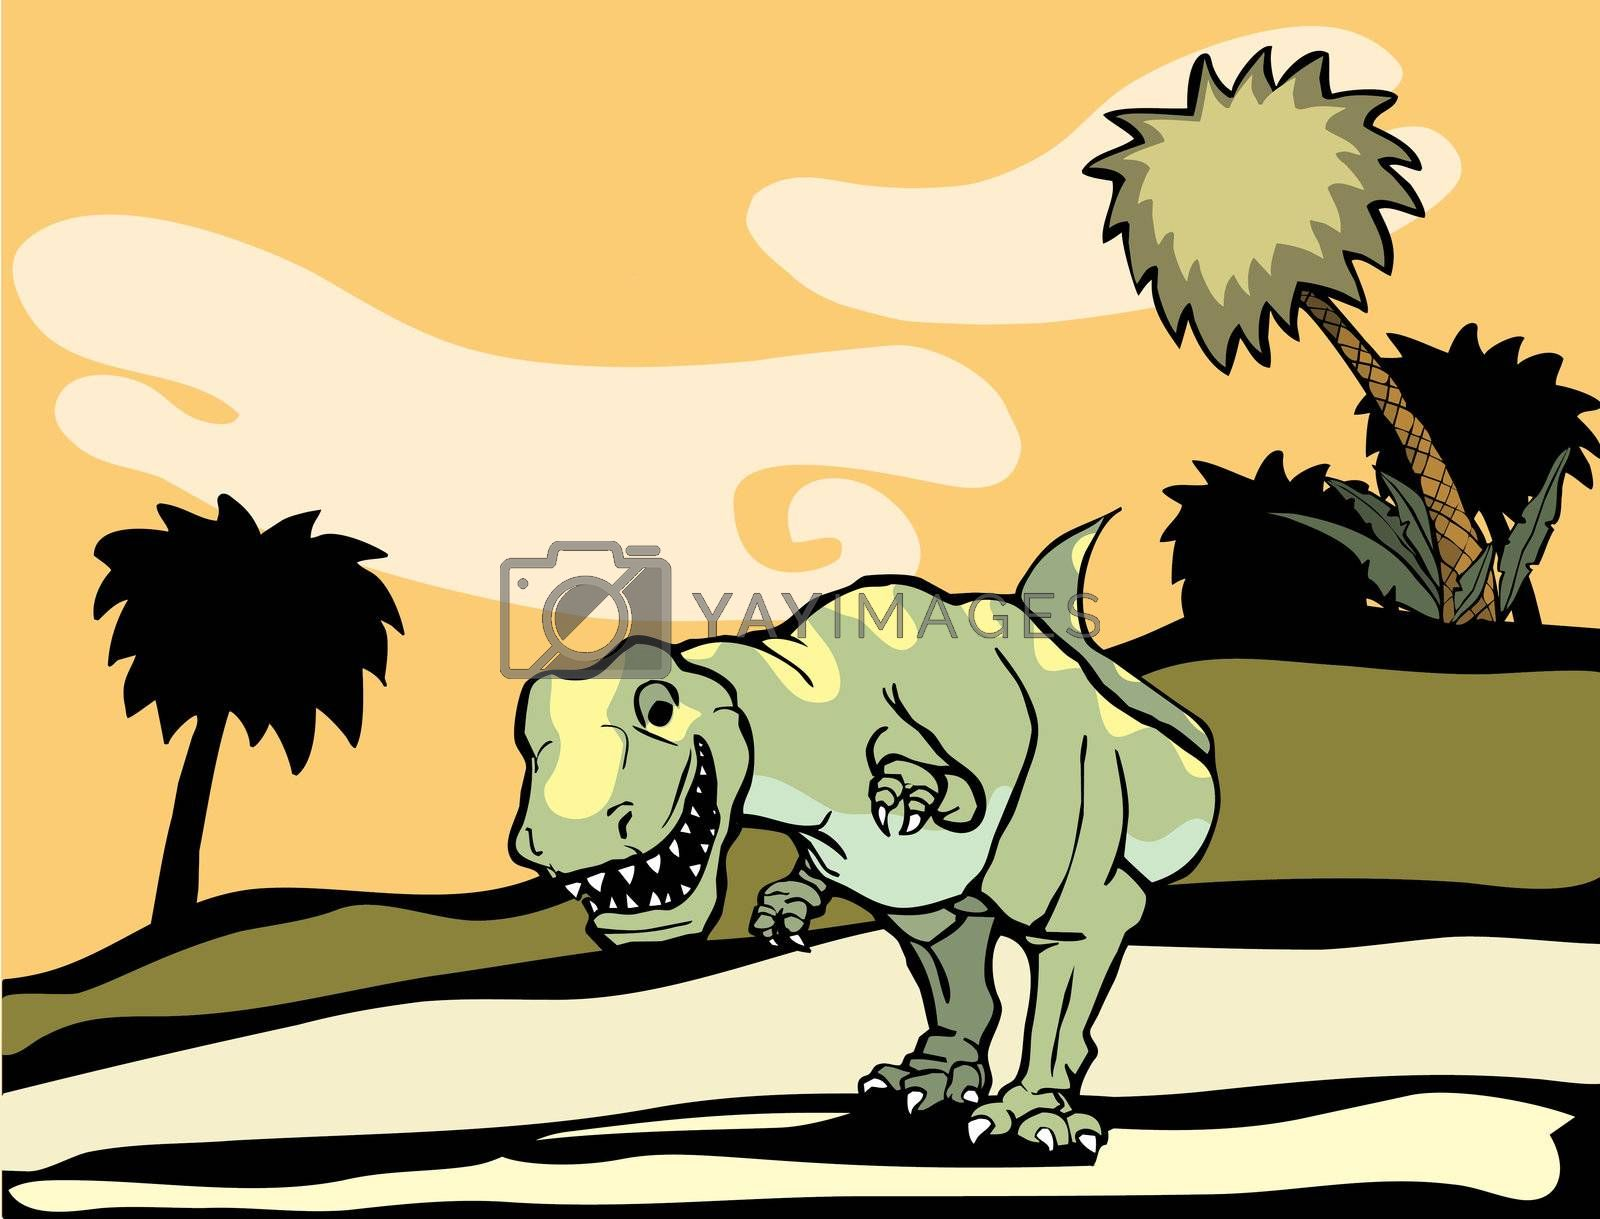 Smiling Tyrannosaurus Rex with yellow patterning walks through palm trees.